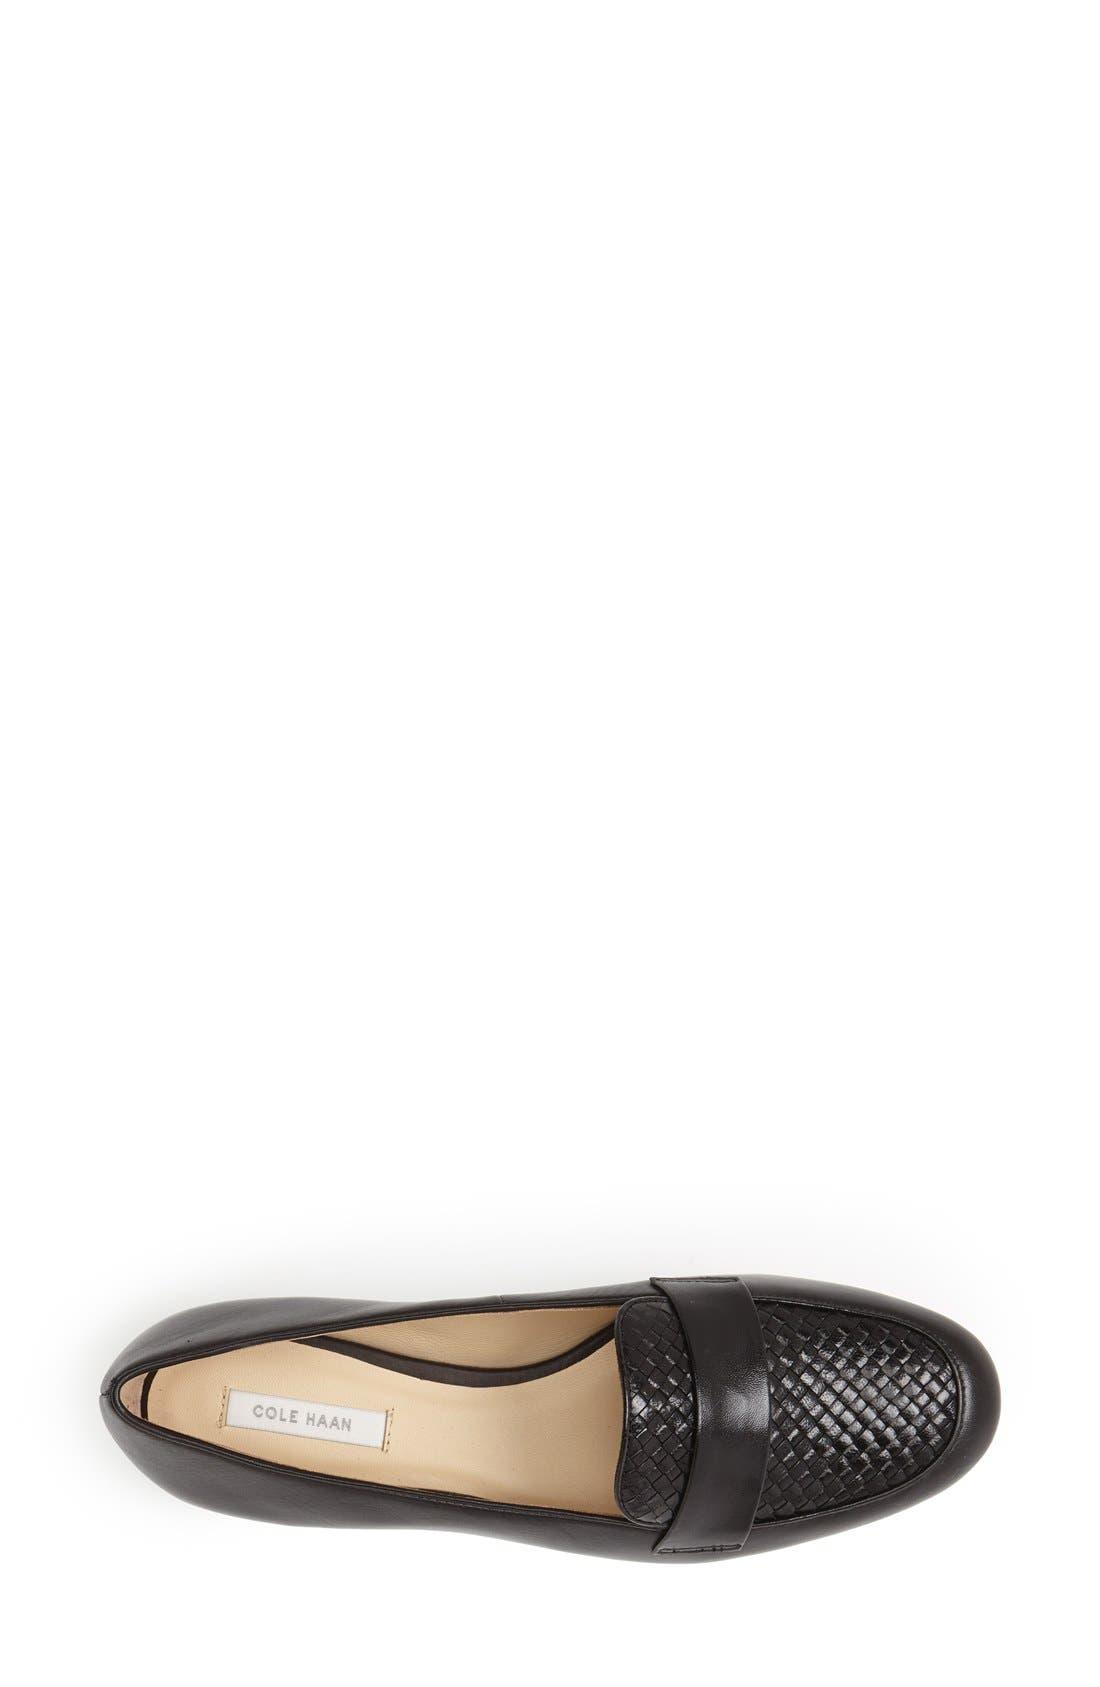 Alternate Image 3  - Cole Haan 'Dakota' Woven Leather Loafer (Women)